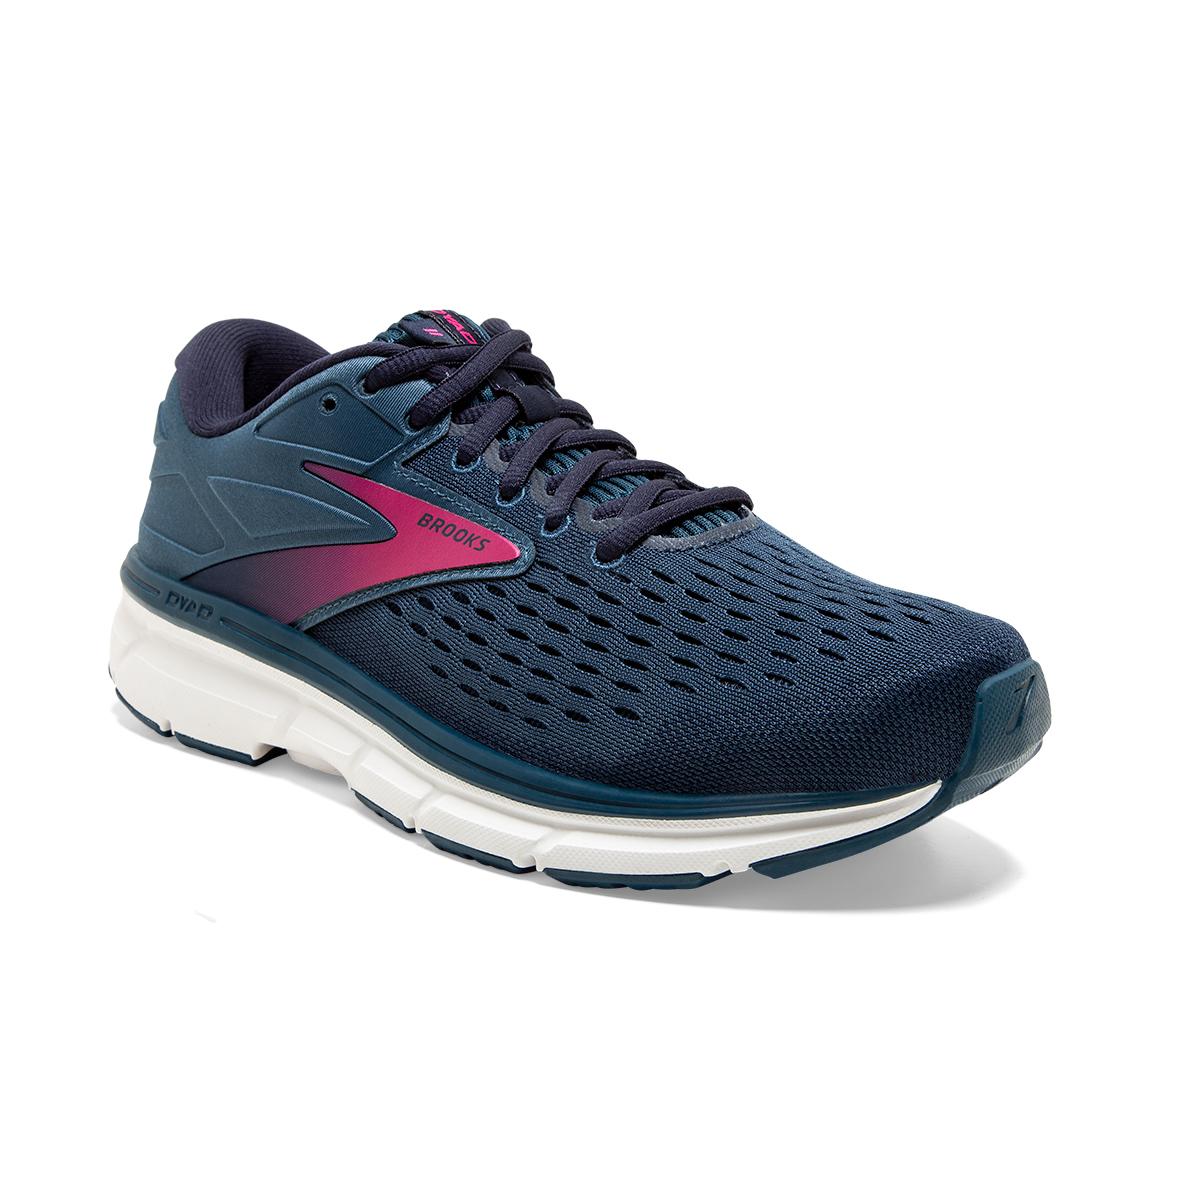 Women's Brooks Dyad 11 Running Shoe - Color: Blue/Navy/Beetroot (Regular Width) - Size: 7.5, Blue/Navy/Beetroot, large, image 3